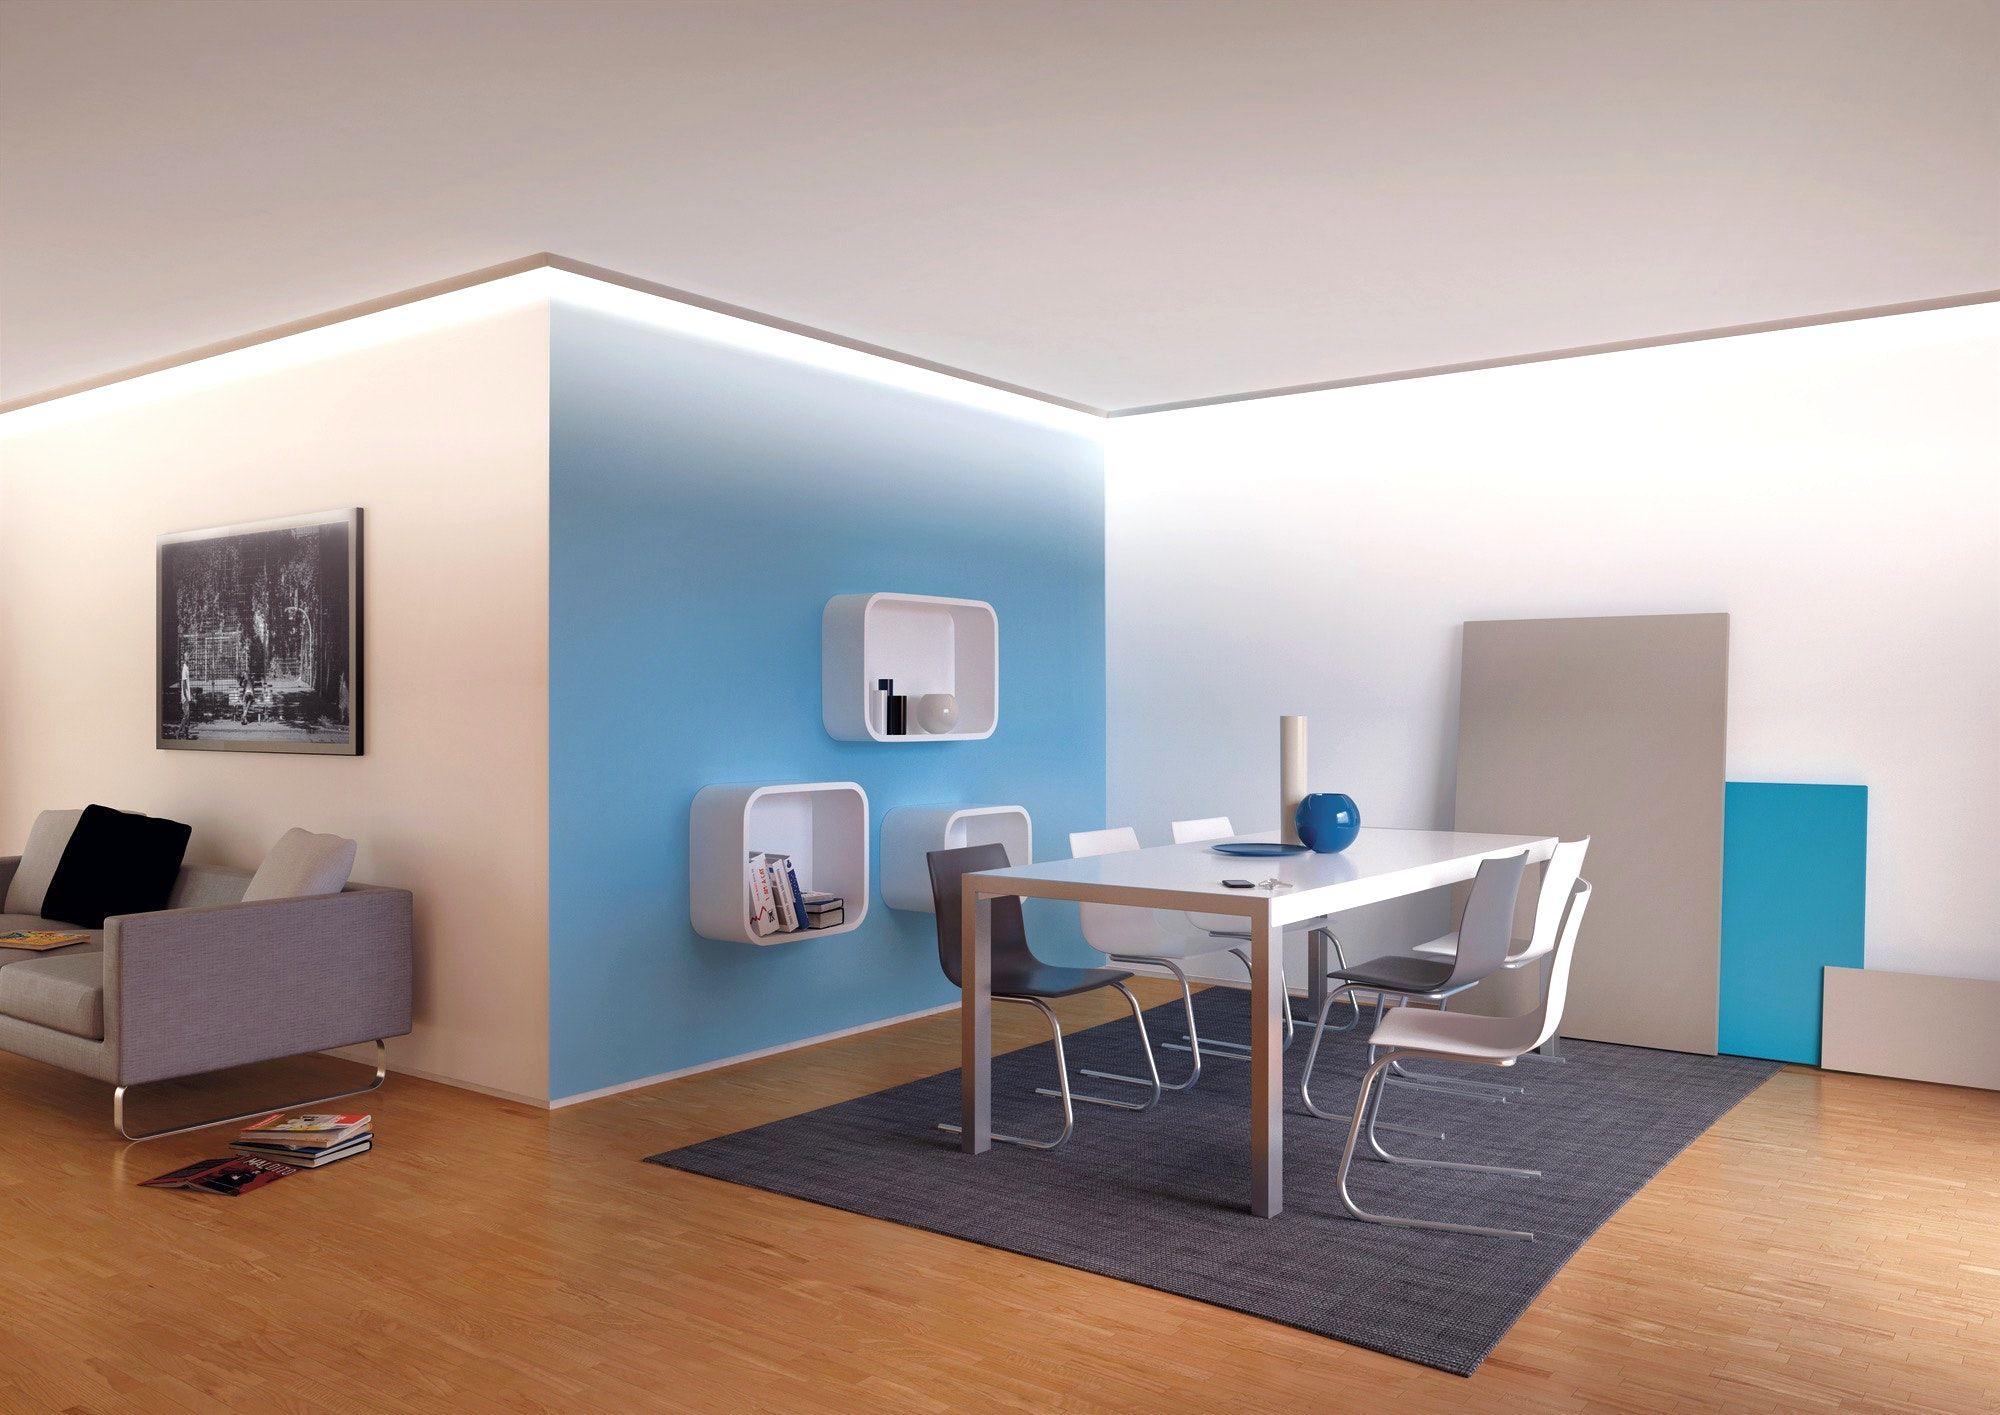 deckenbeleuchtung wohnzimmer planen Beleuchtung